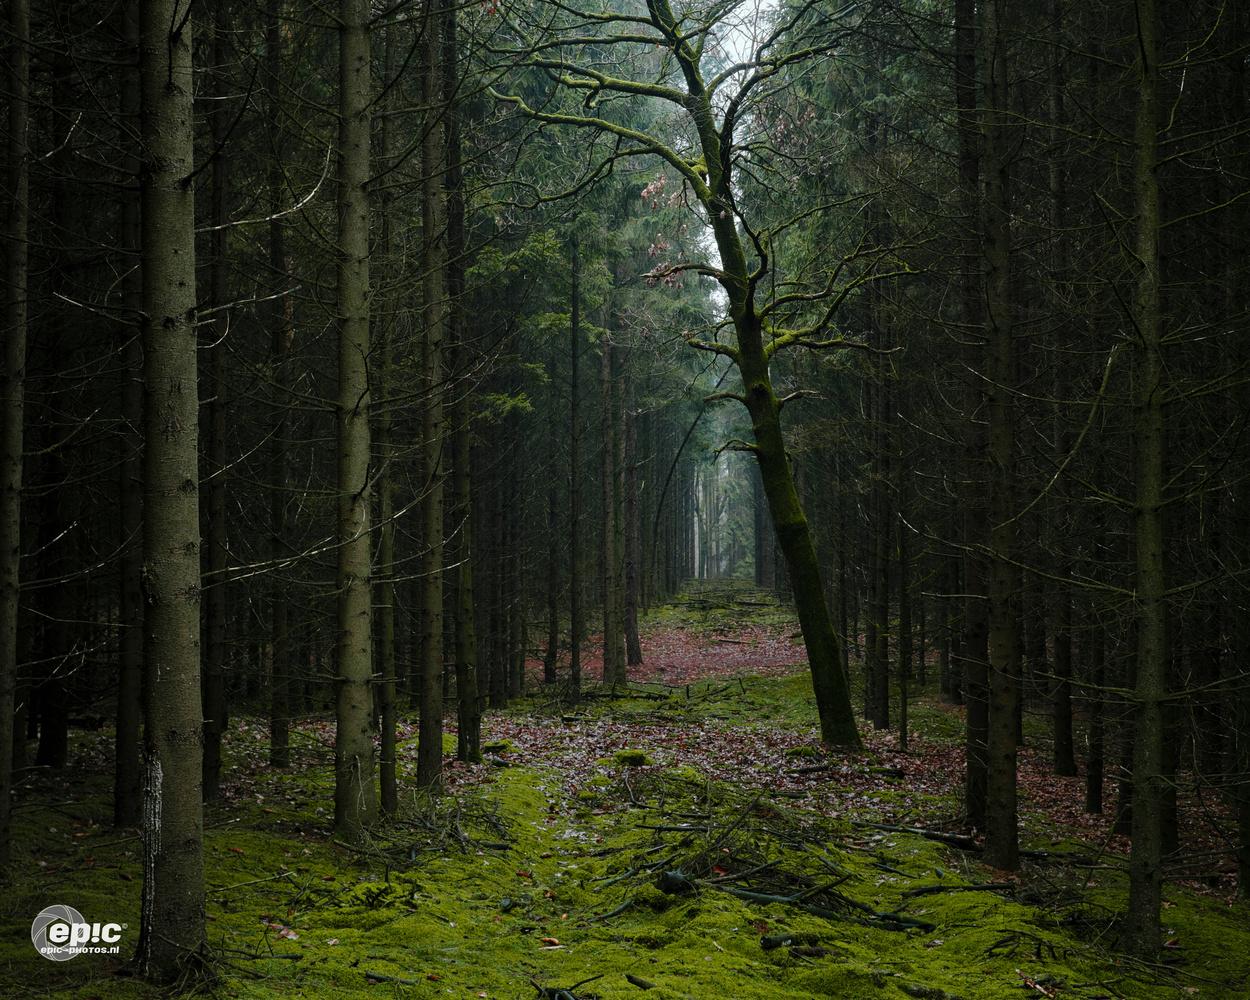 Wood Mood by Erick Van Rijswick